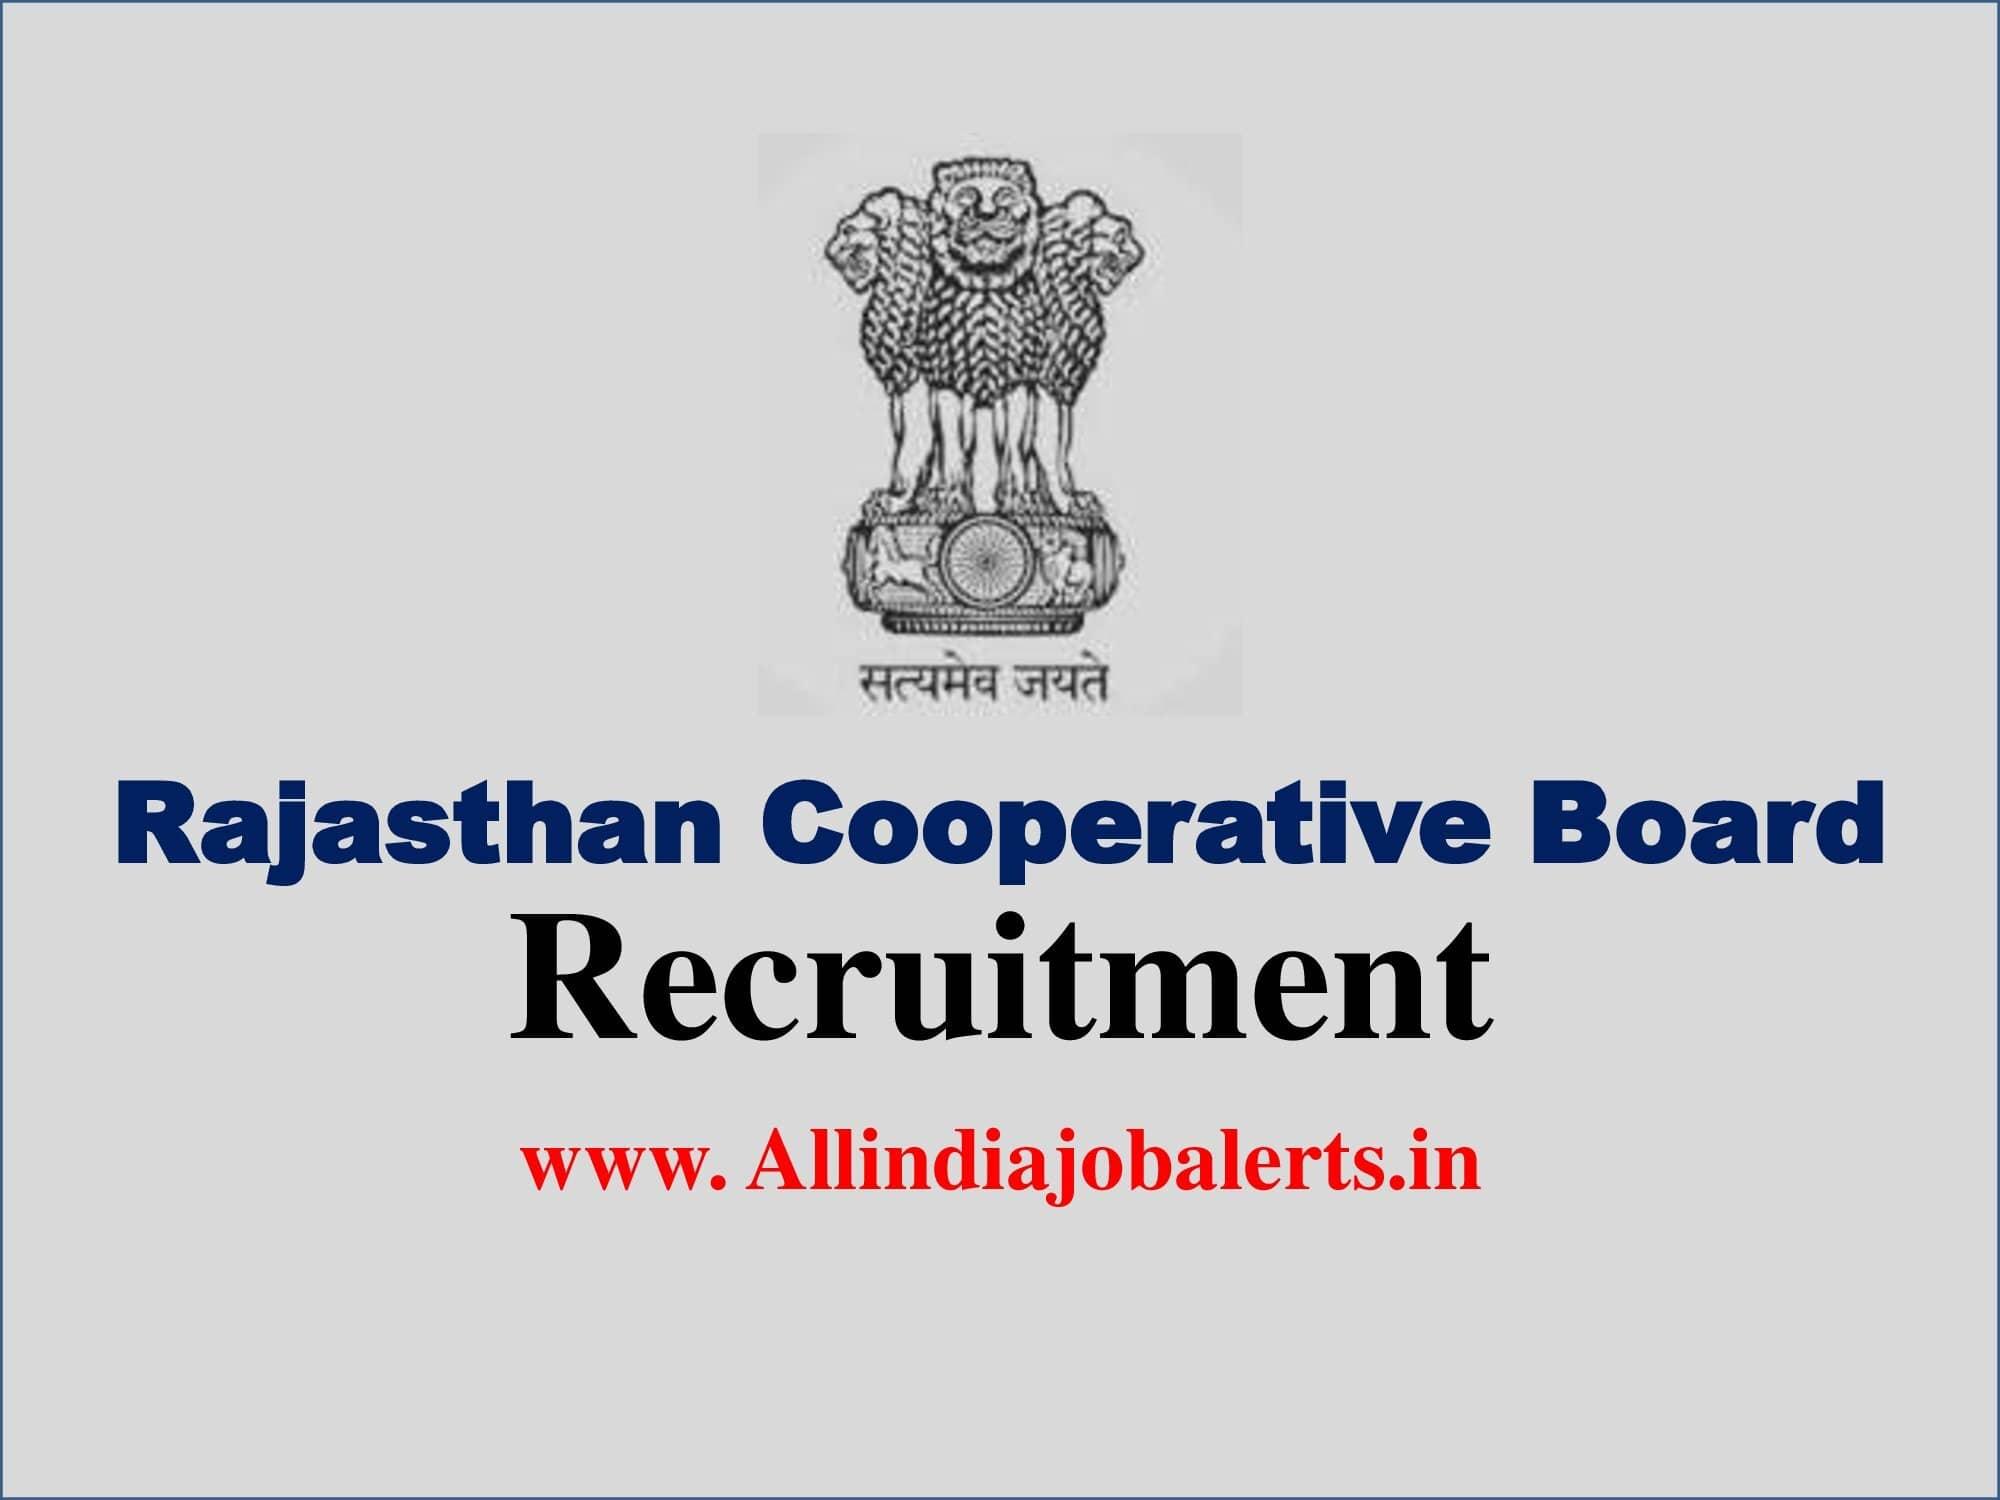 Rajasthan Cooperative Bank